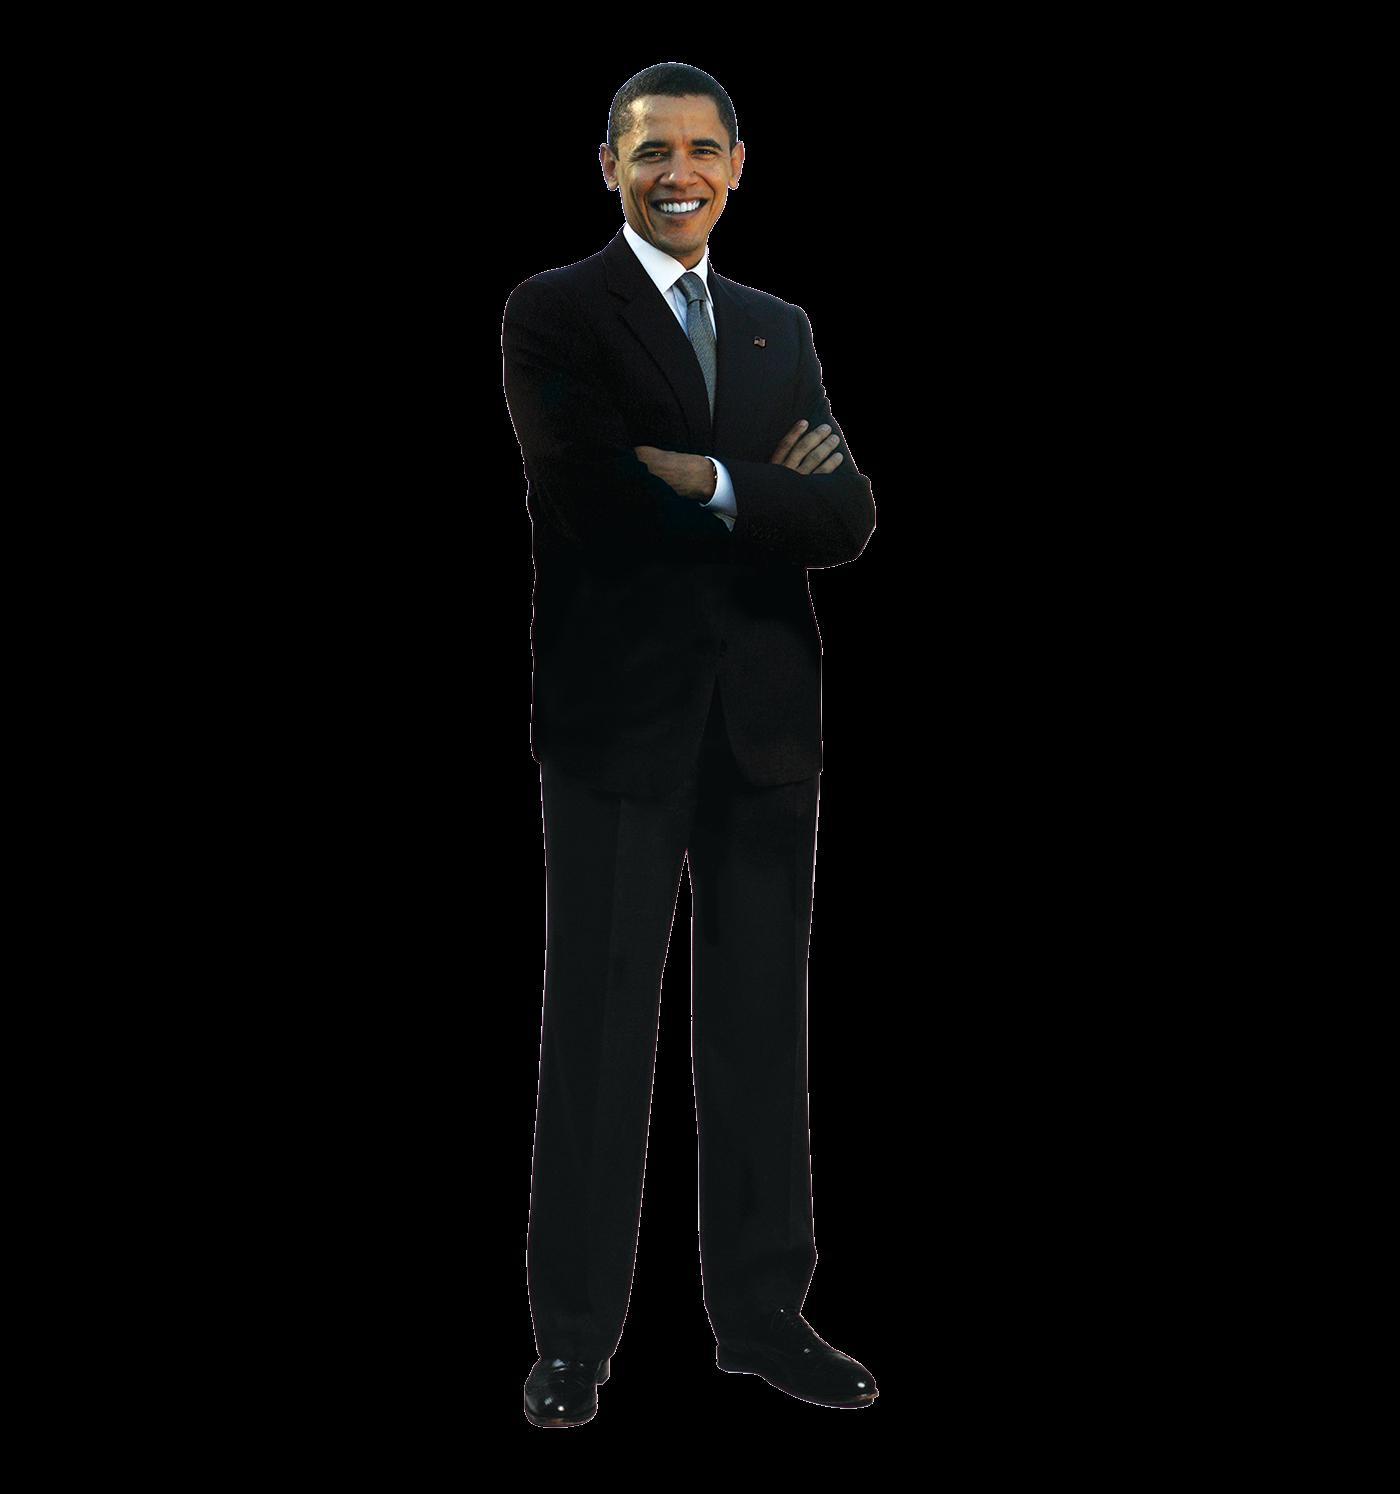 Barack obama png image. President clipart public forum